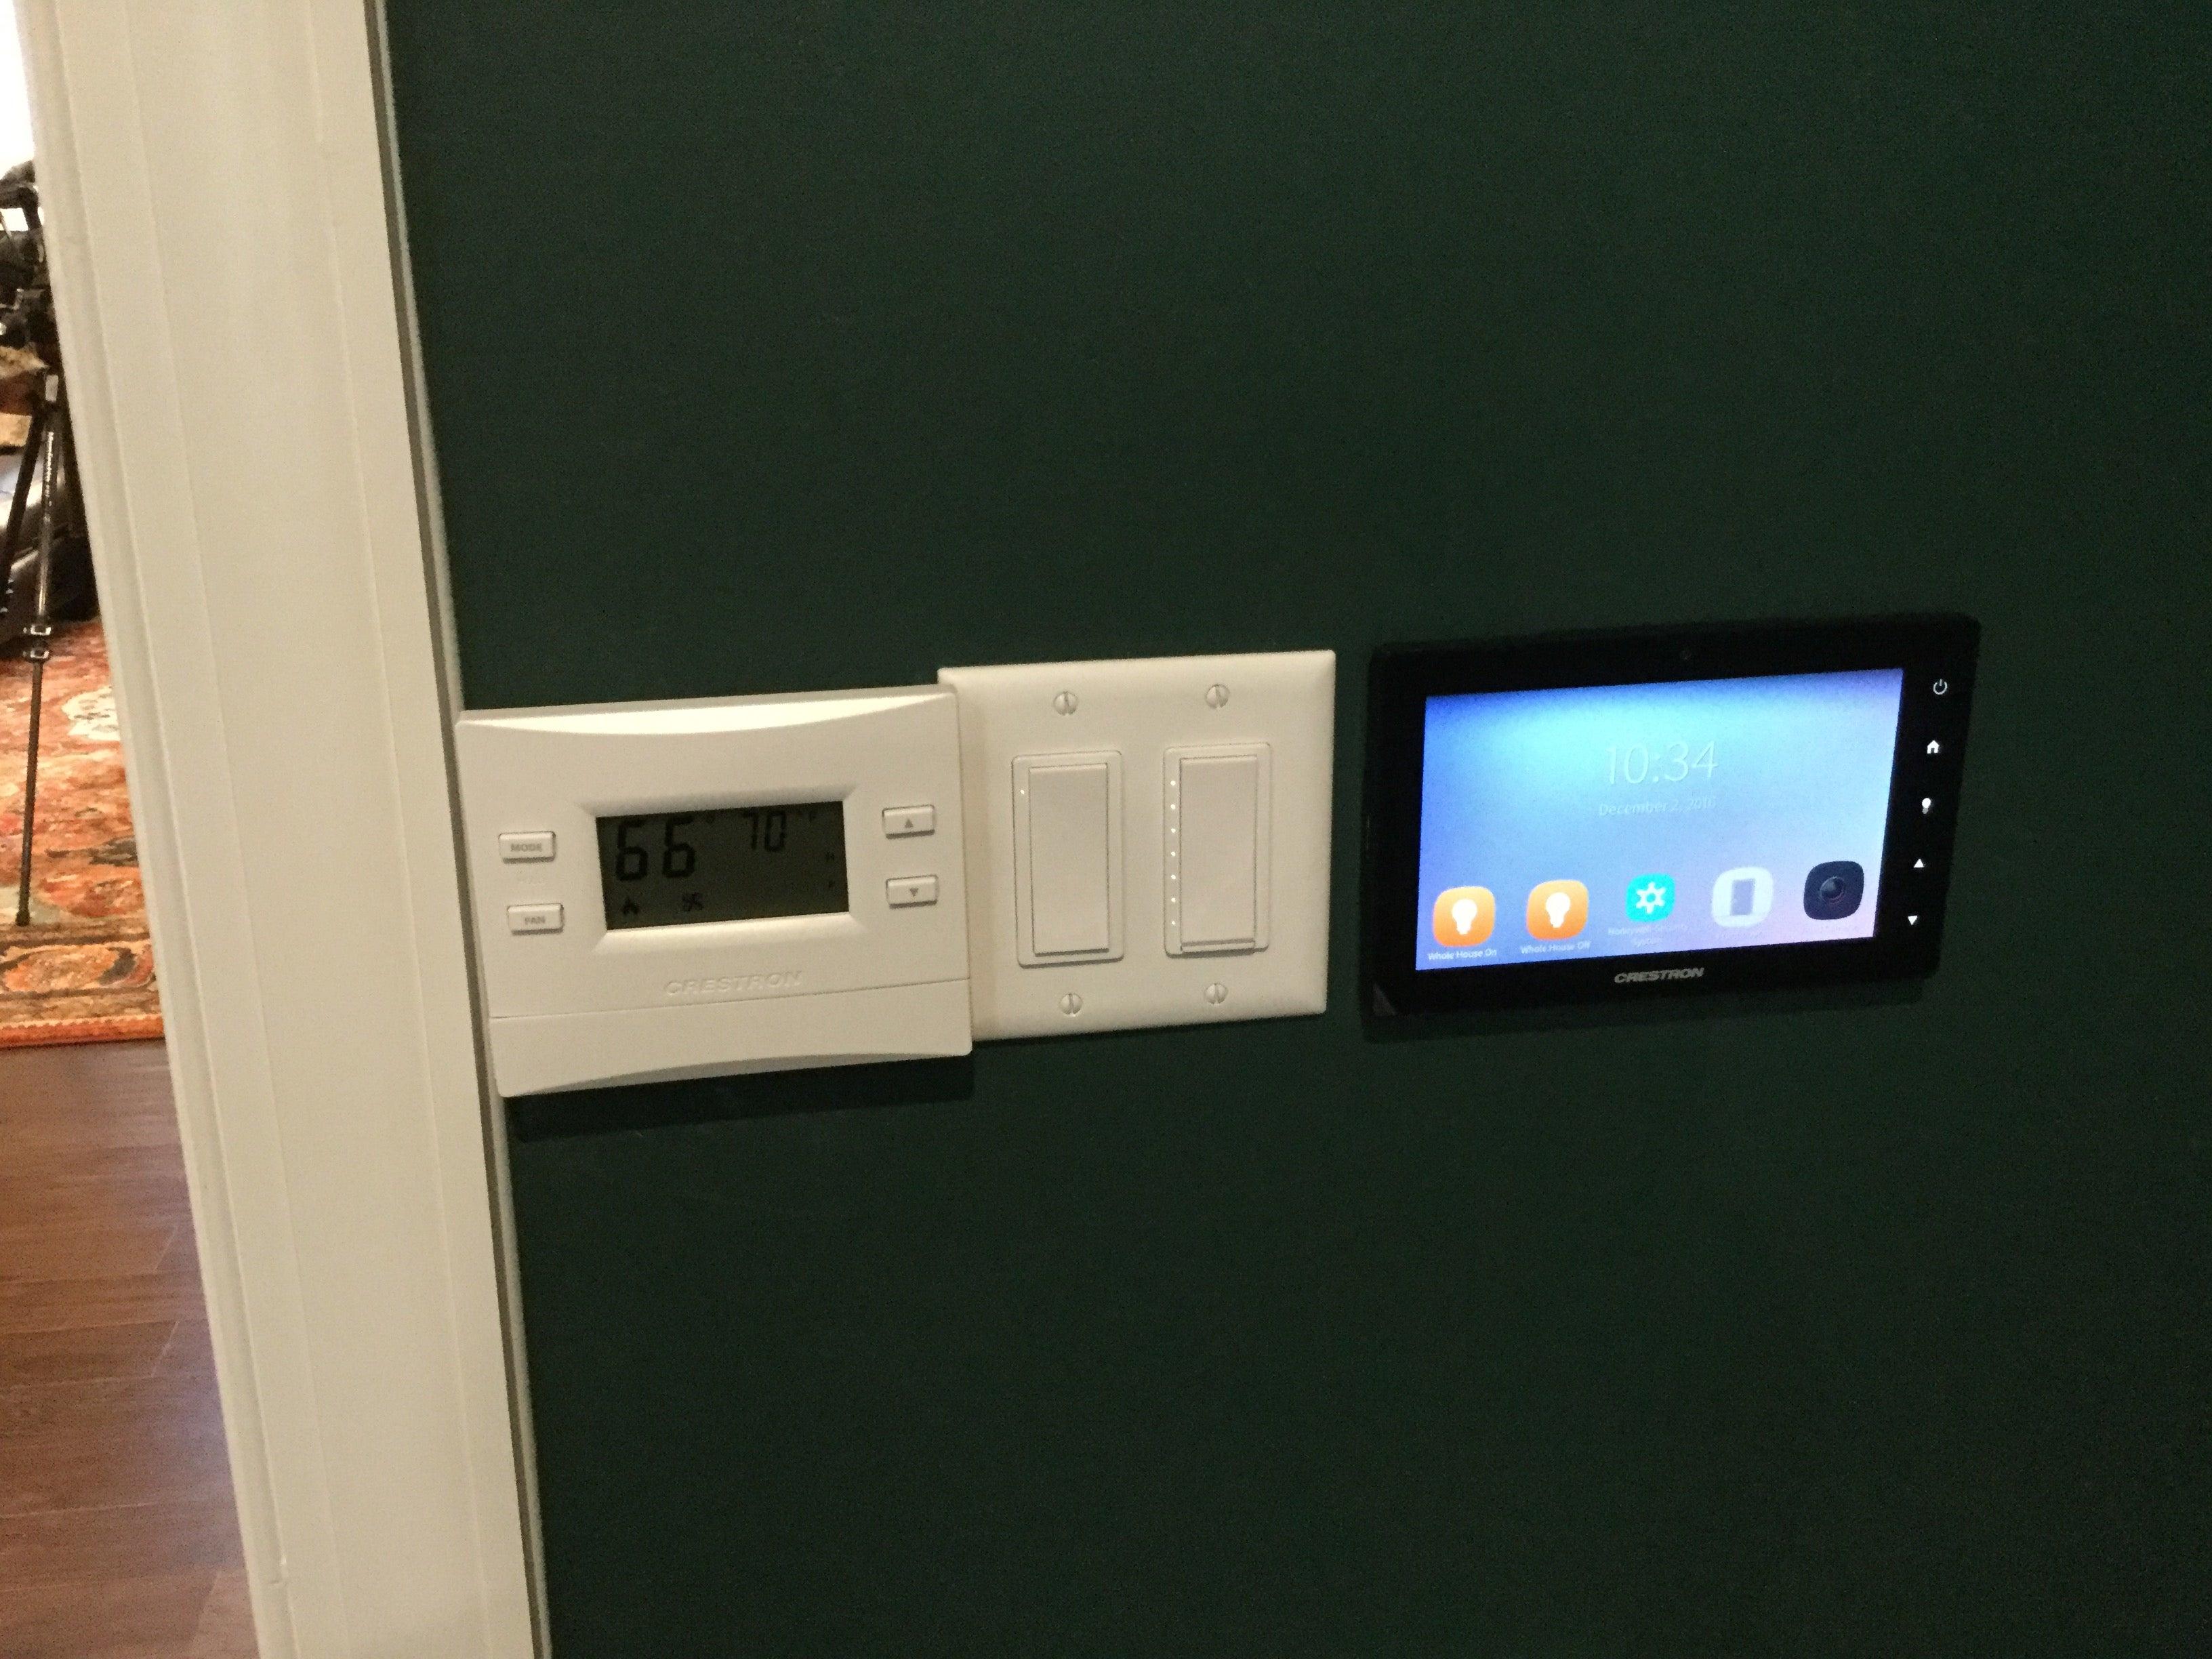 Whole house controlled via smartphone or iPad